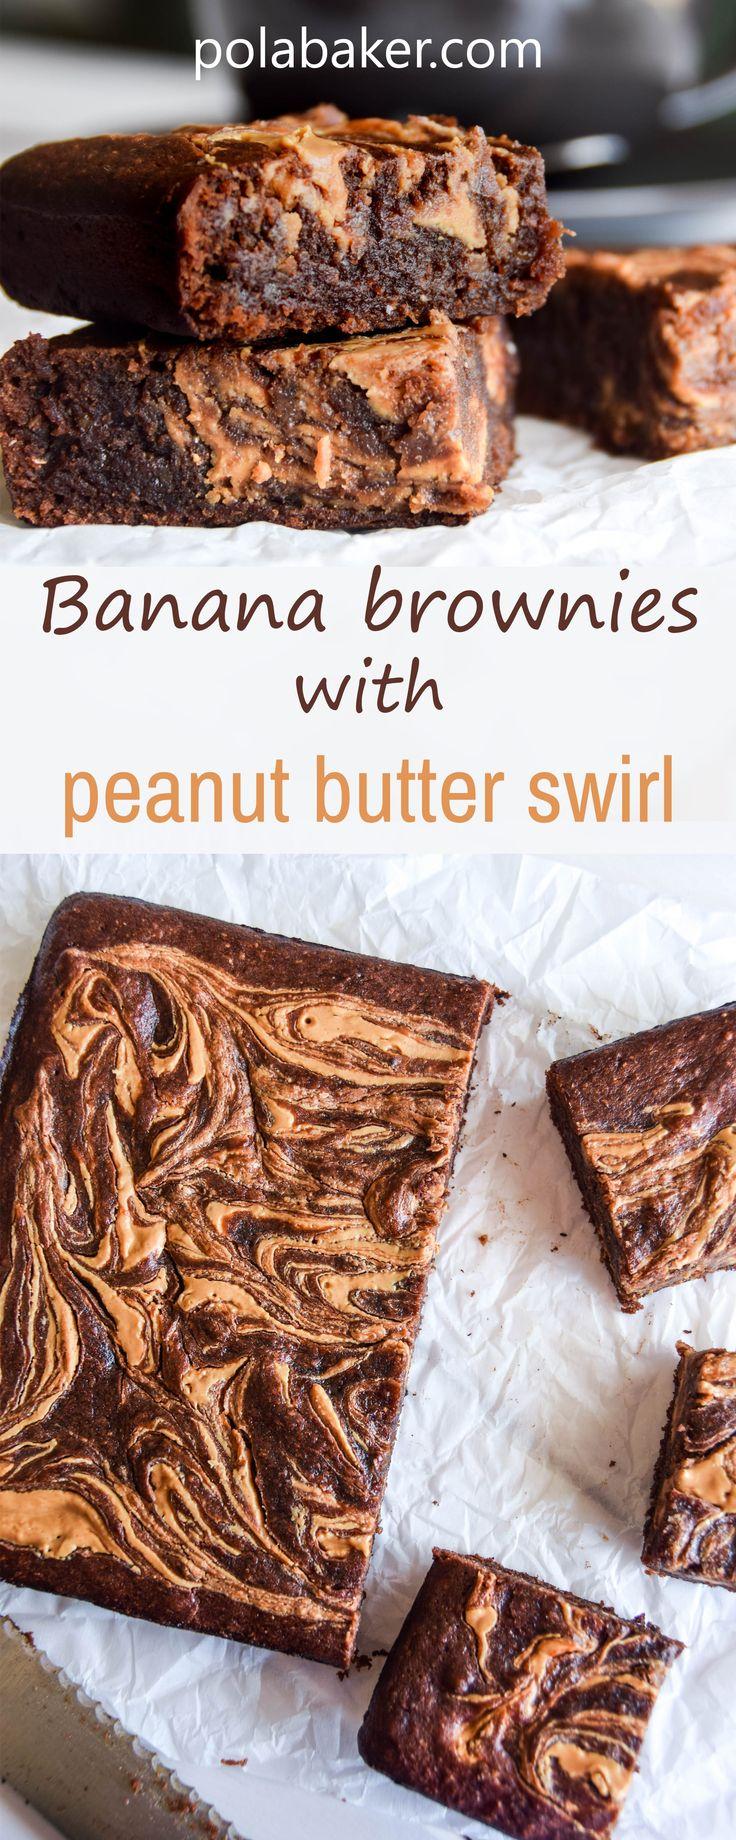 Banana brownie with peanut butter swirl